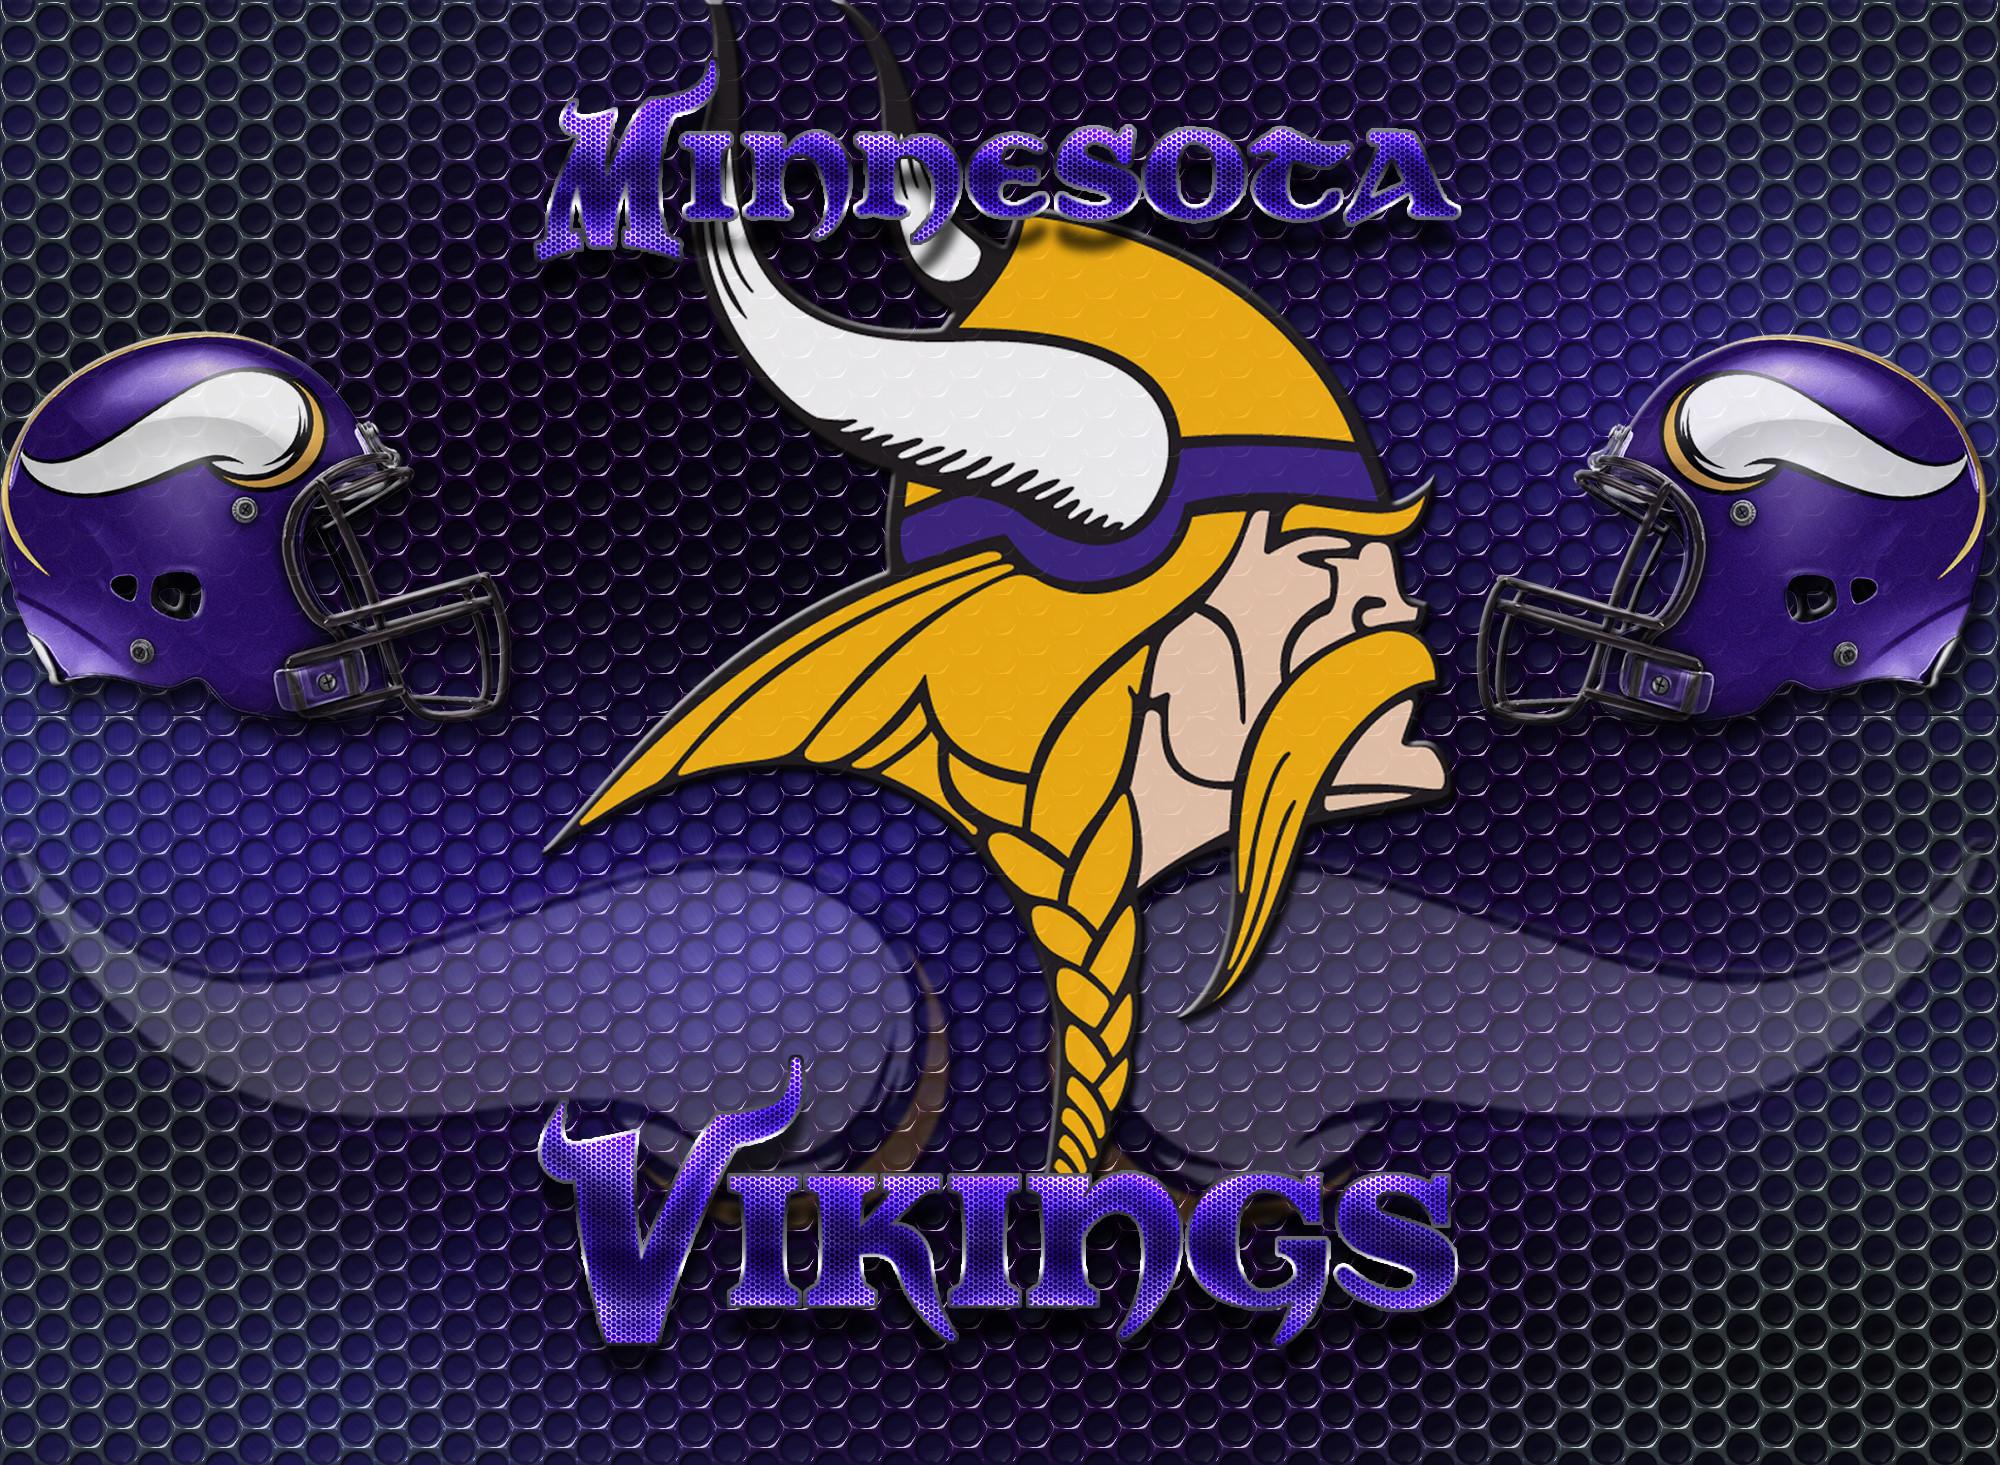 Minnesota Vikings Wallpapers ·① WallpaperTag